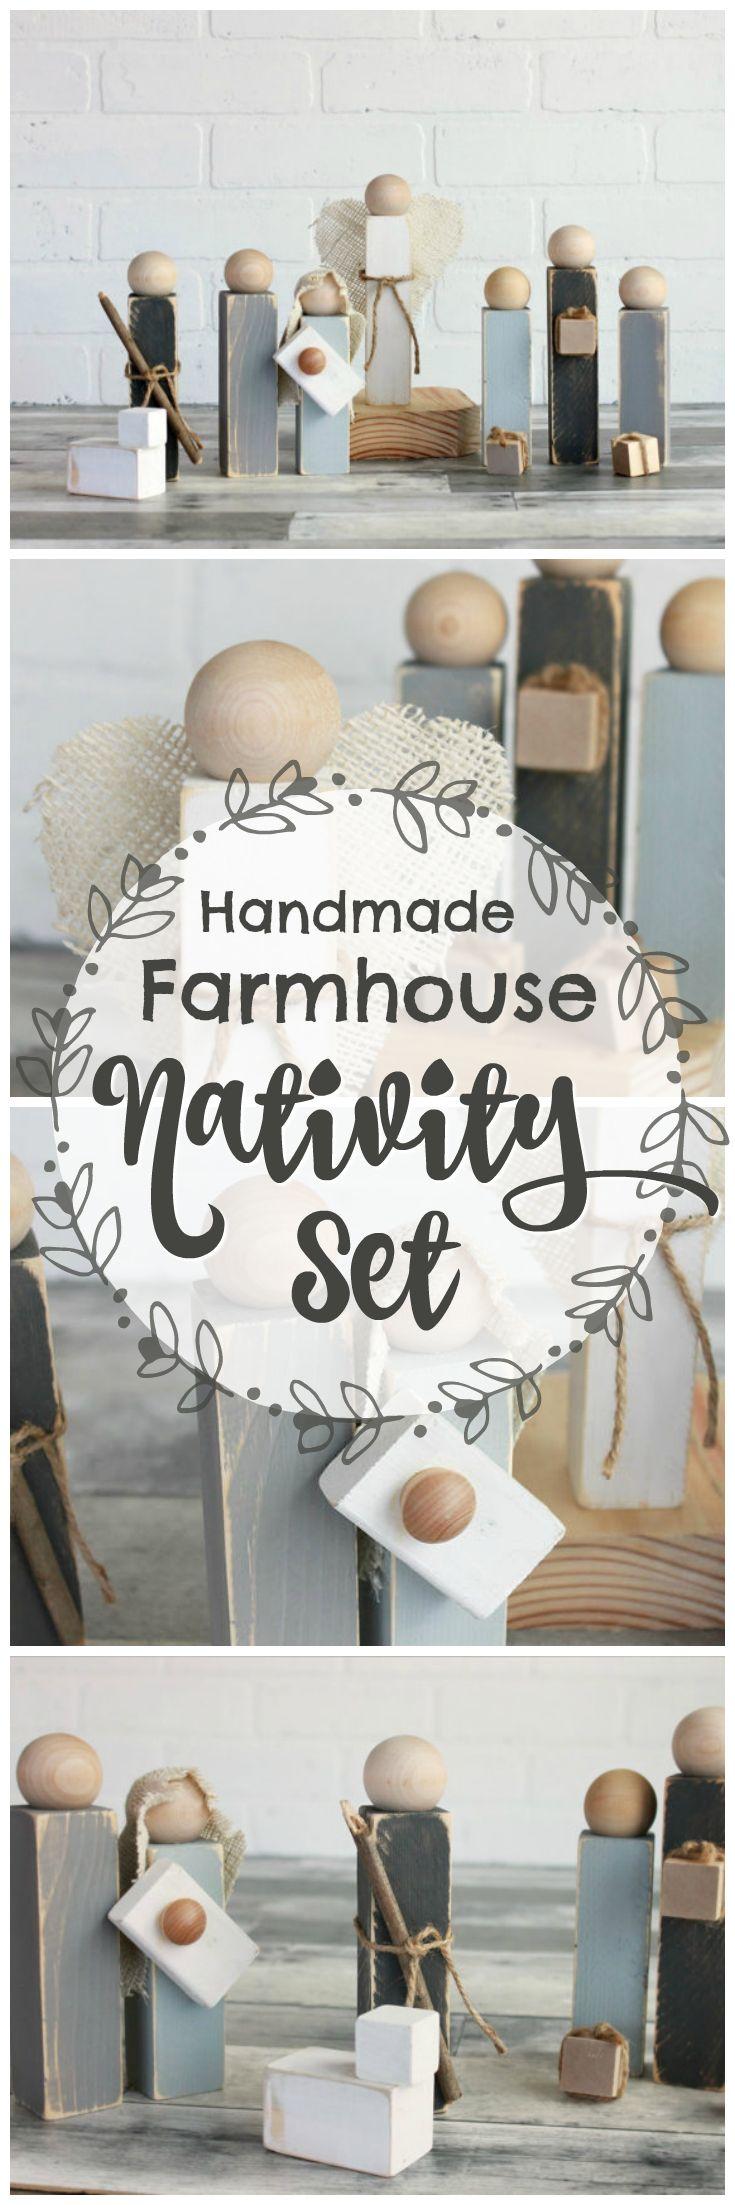 Handmade, rustic, wooden nativity set, for a farmhouse